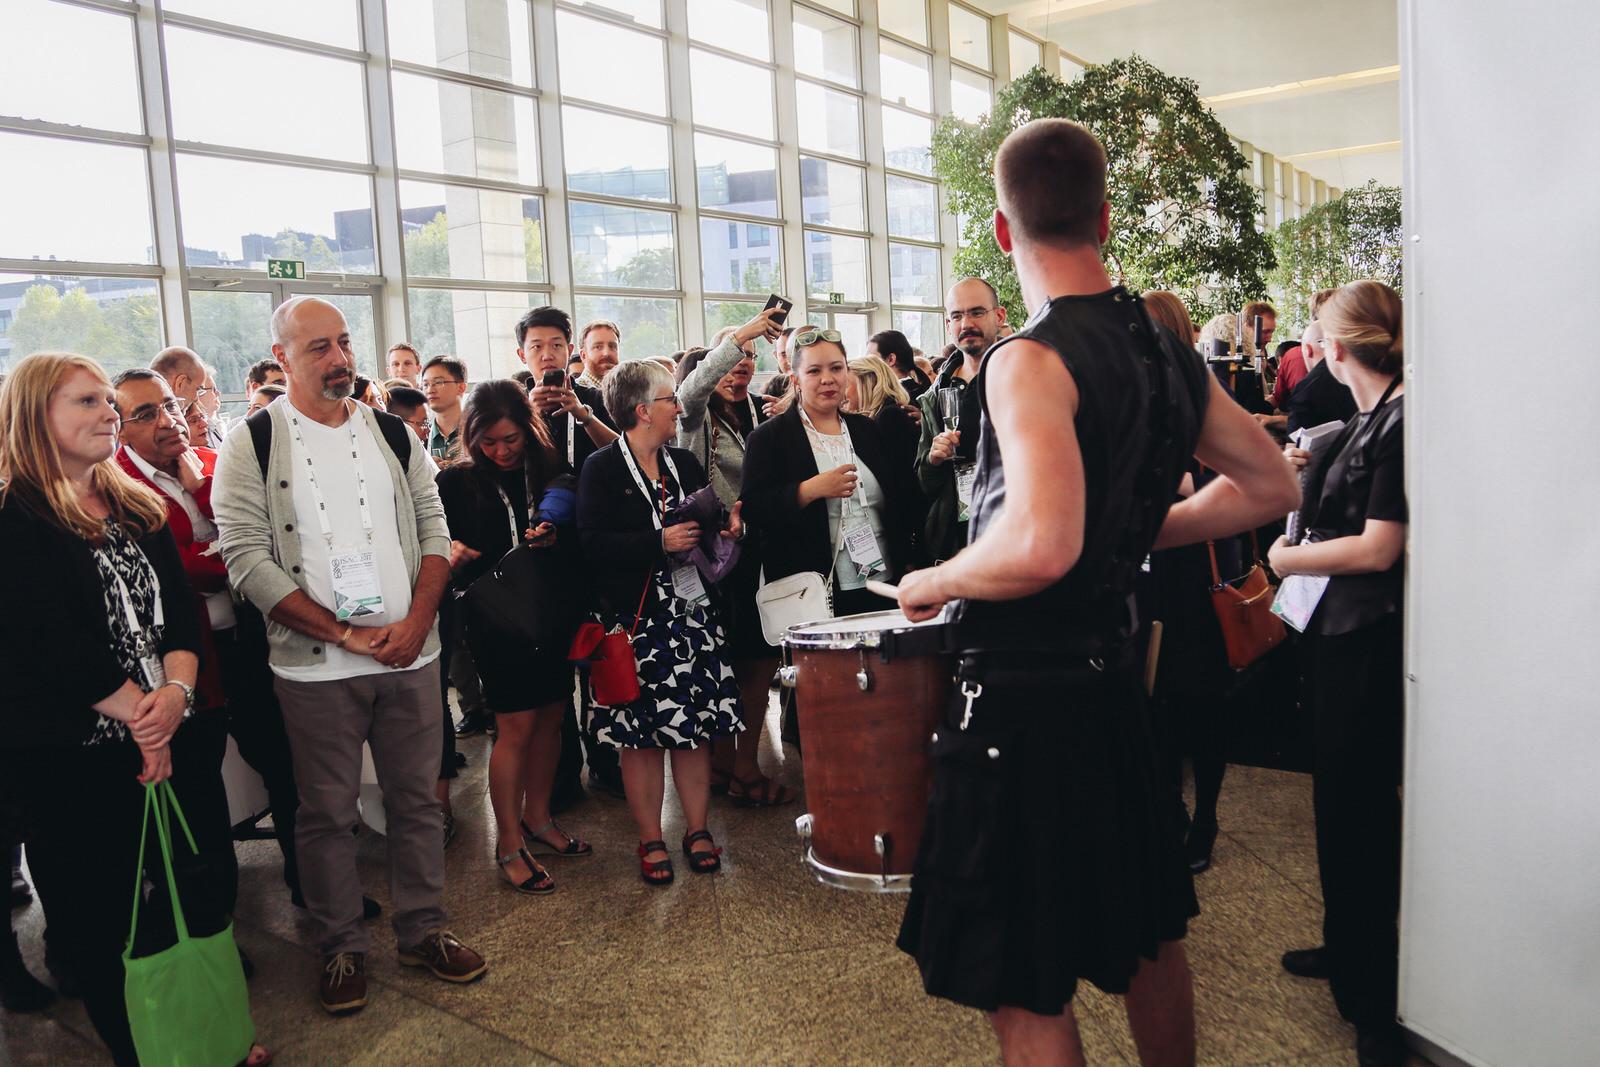 Corporate-conference-photographer-dublin-029.jpg